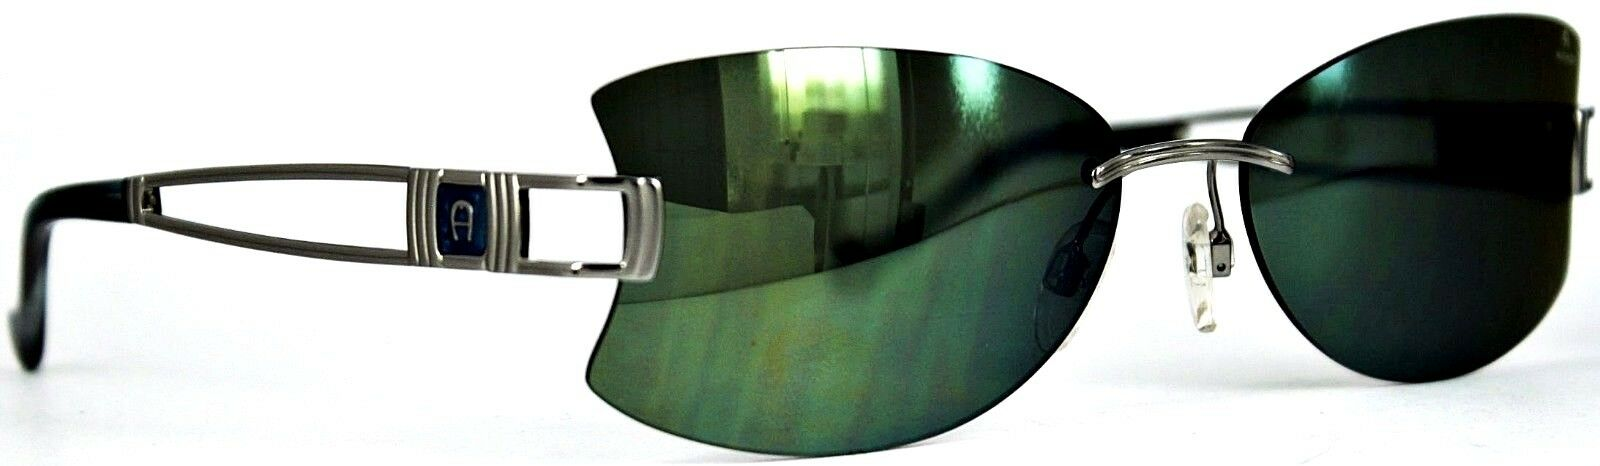 Aigner señora gafas de sol mod. ea646 301 plata // 249 (35)